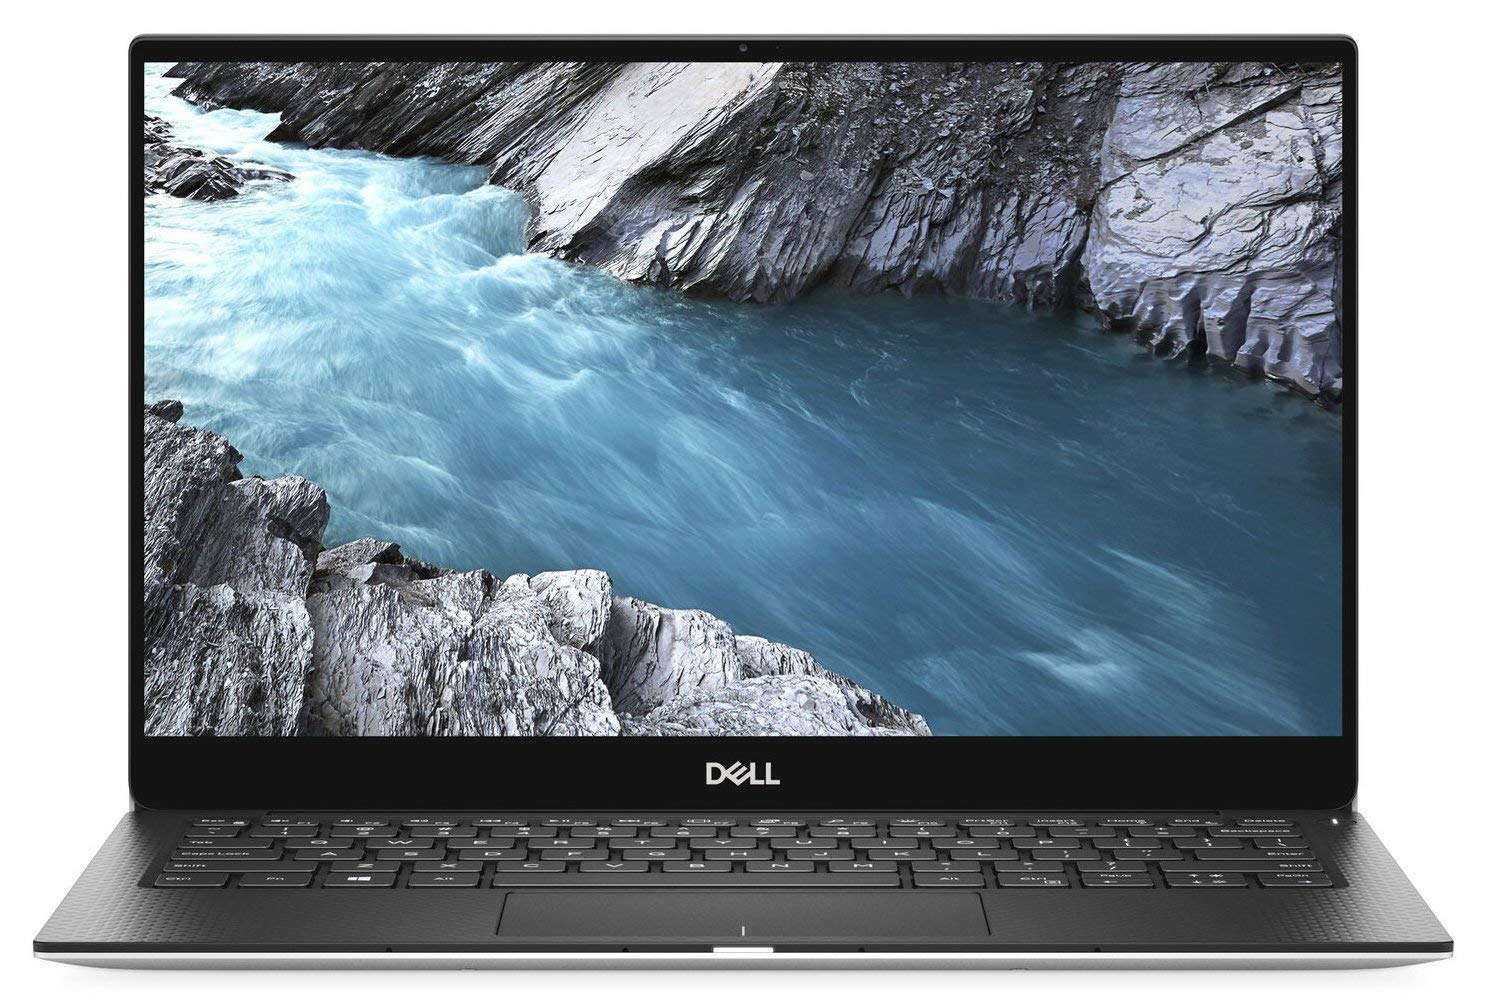 Купить Ноутбуки, Ноутбук Dell XPS 13 9380 9380Ui716S3UHD-WSL Silver